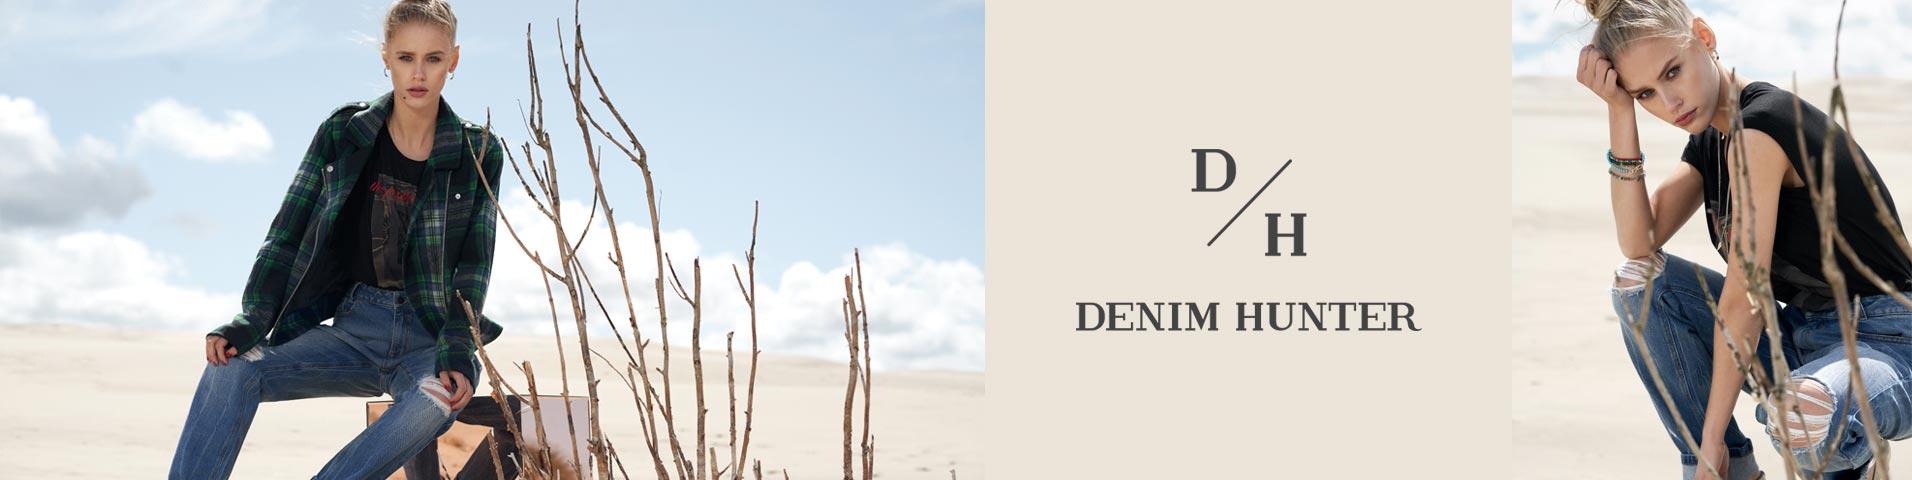 Denim Hunter Toppar   Dam   Rea online på Zalando.se